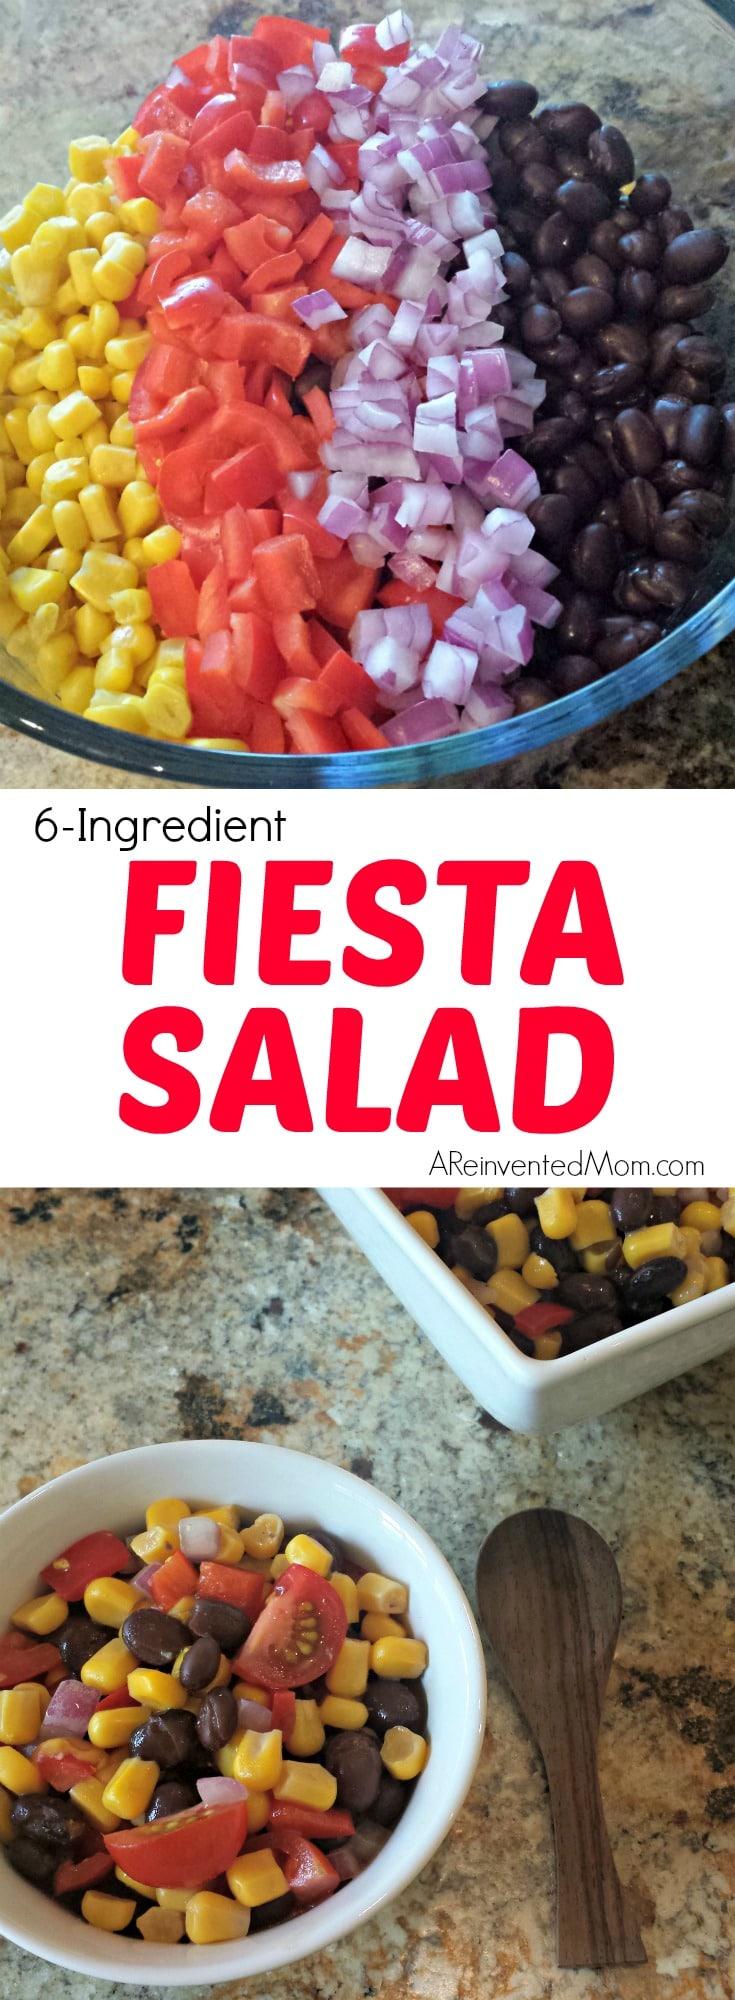 6-Ingredient Fiesta Salad - A Reinvented Mom